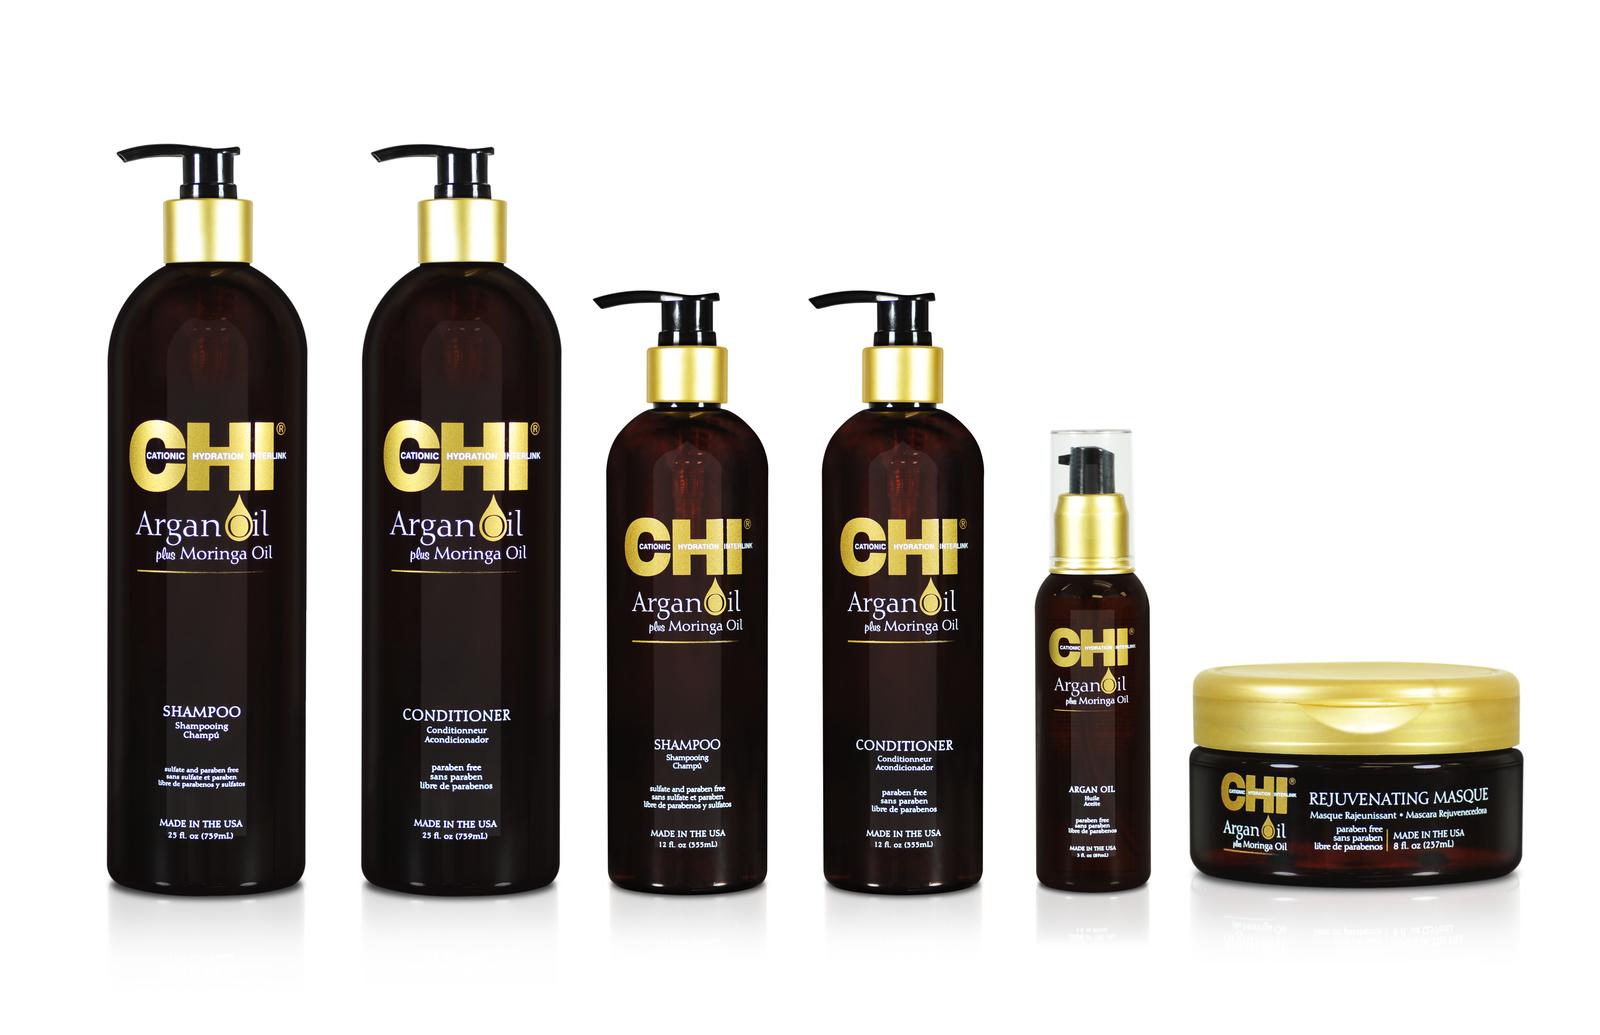 CHI Argan Oil / Средства на основе масла Арганы и дерева Моринга Новинка